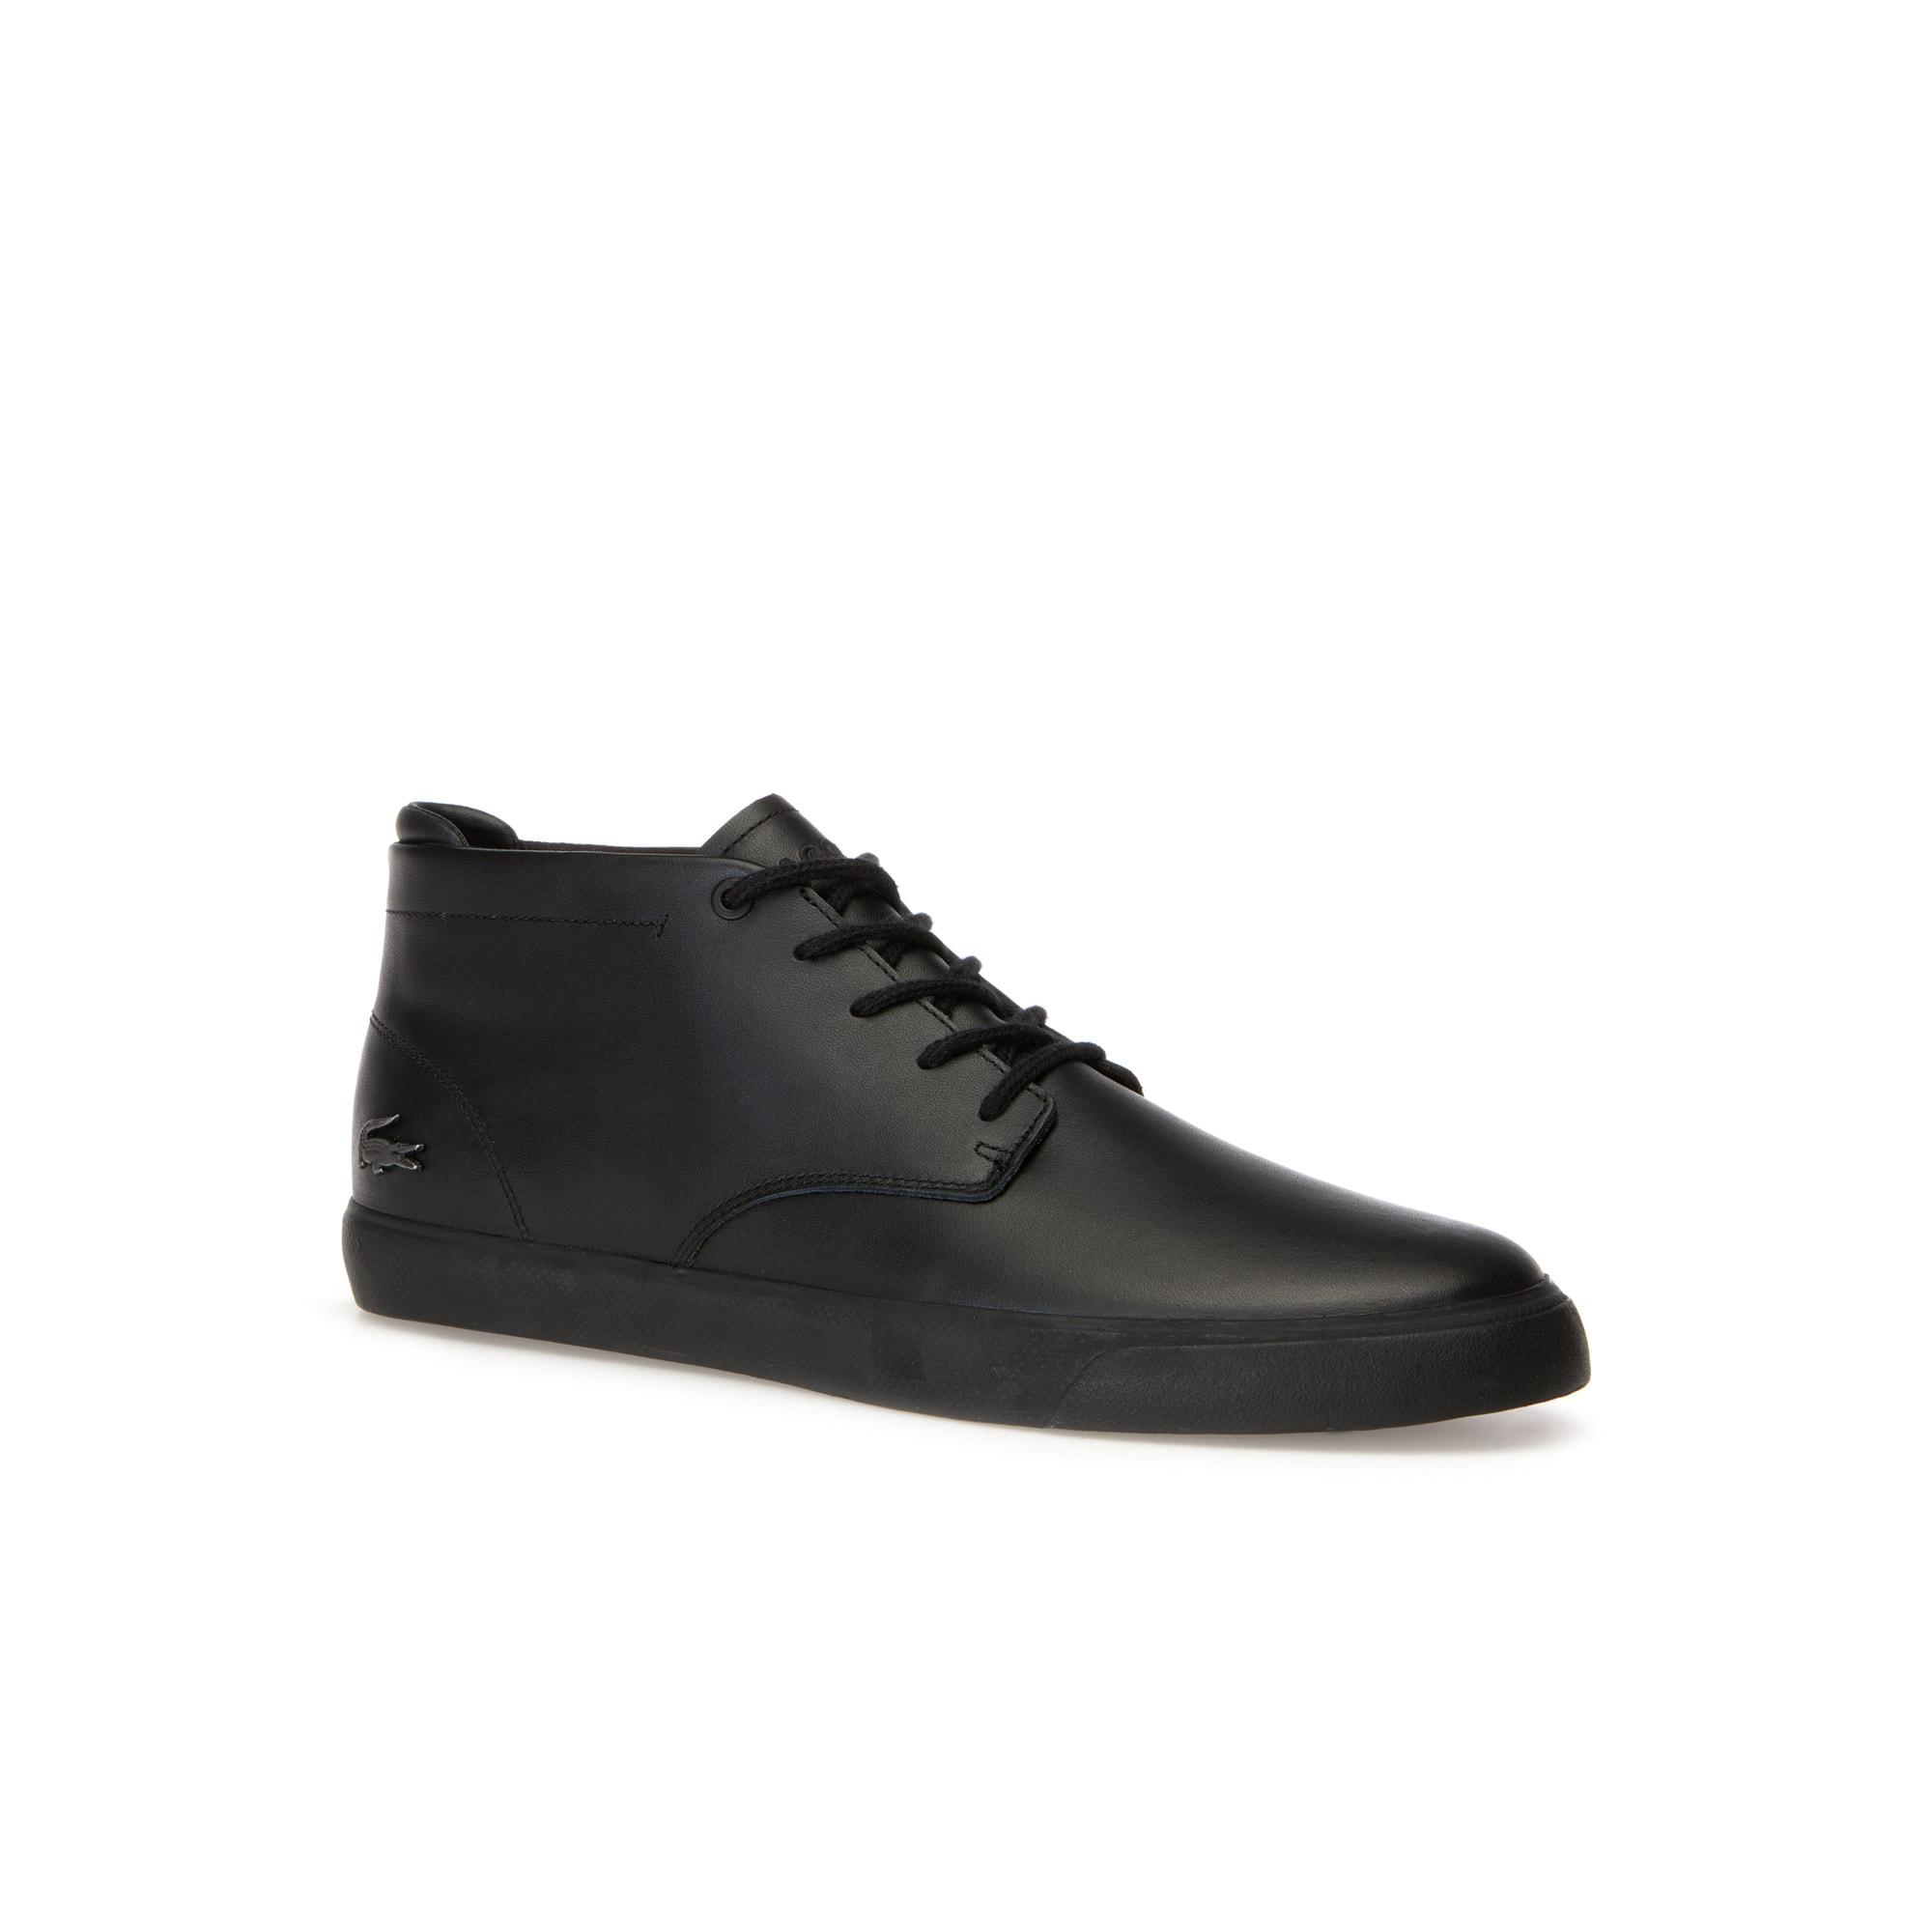 Men's Espere Chukka Leather Sneakers